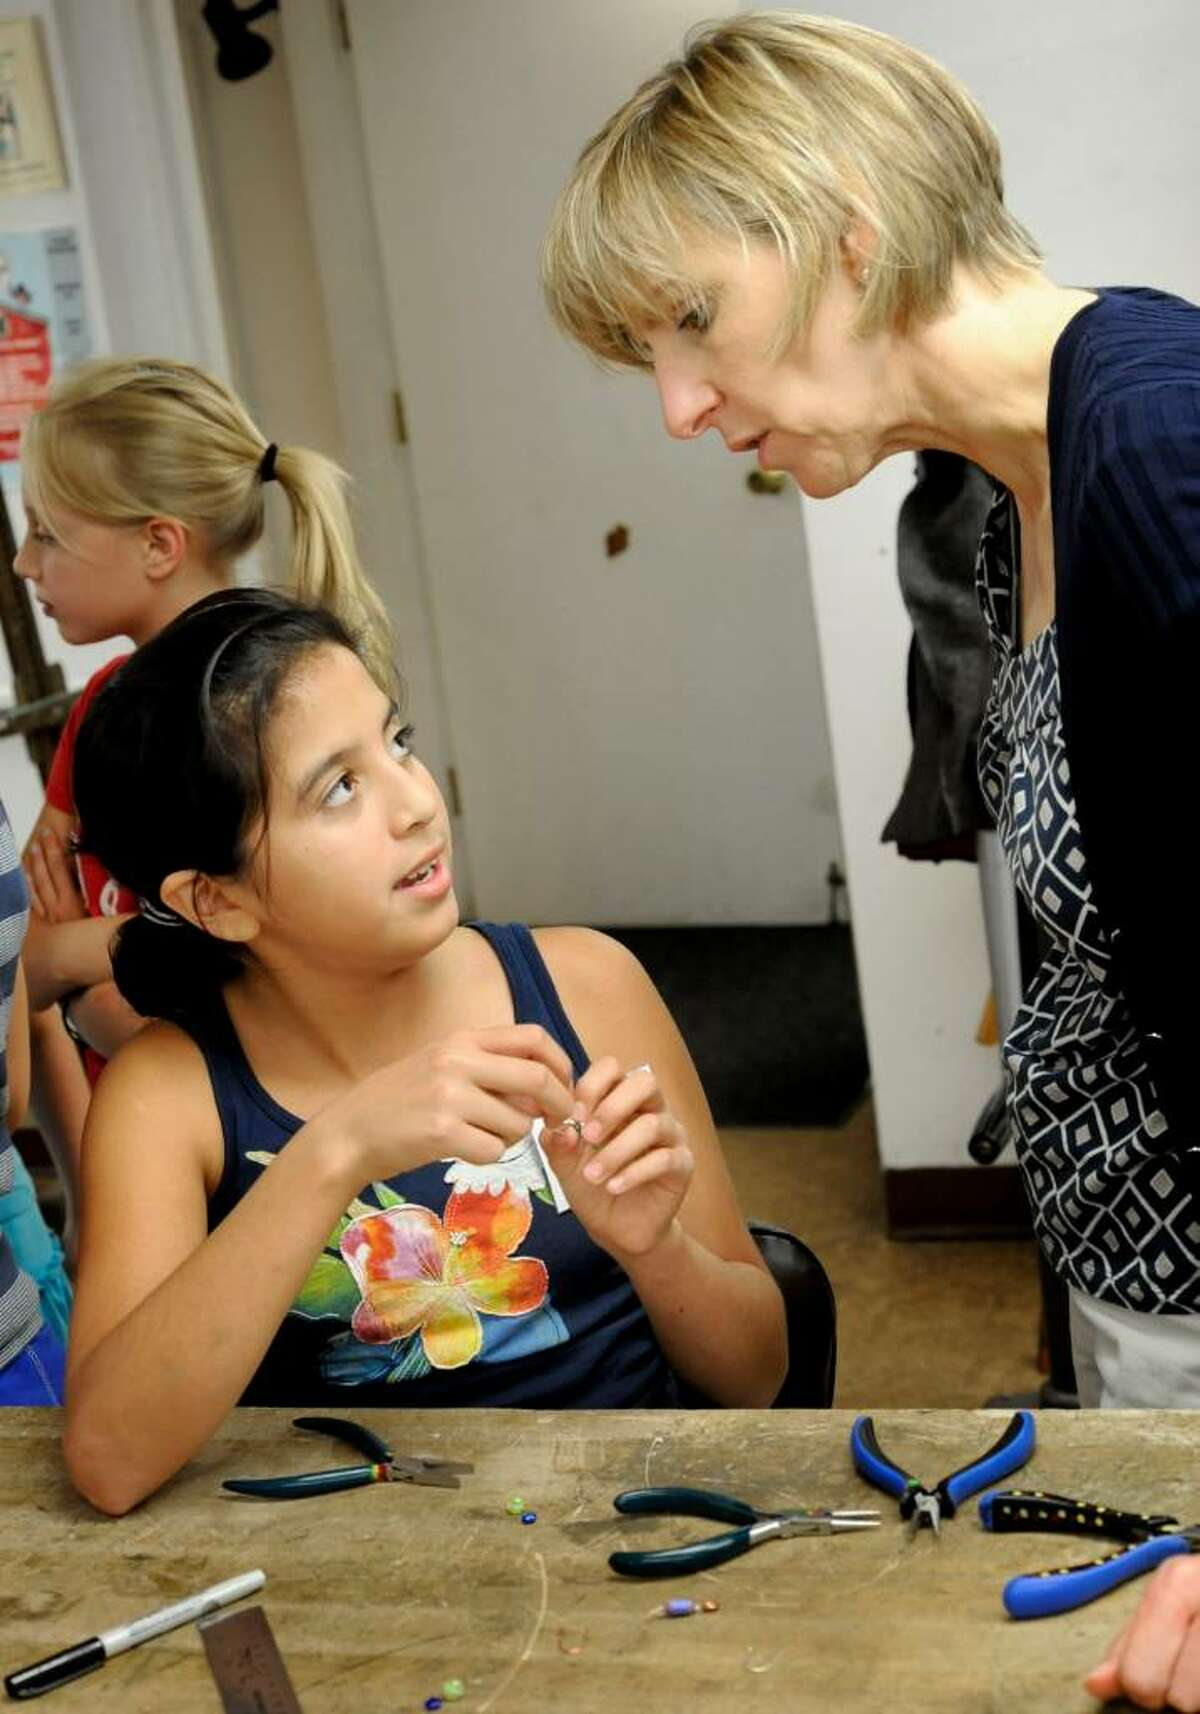 Volunteer Katee Sosa, 11,explains earring making to Barbara Stauder, 54, of Danbury, during the Brookfield Craft Center's Open House '09 on Sunday, Sept. 6, 2009.